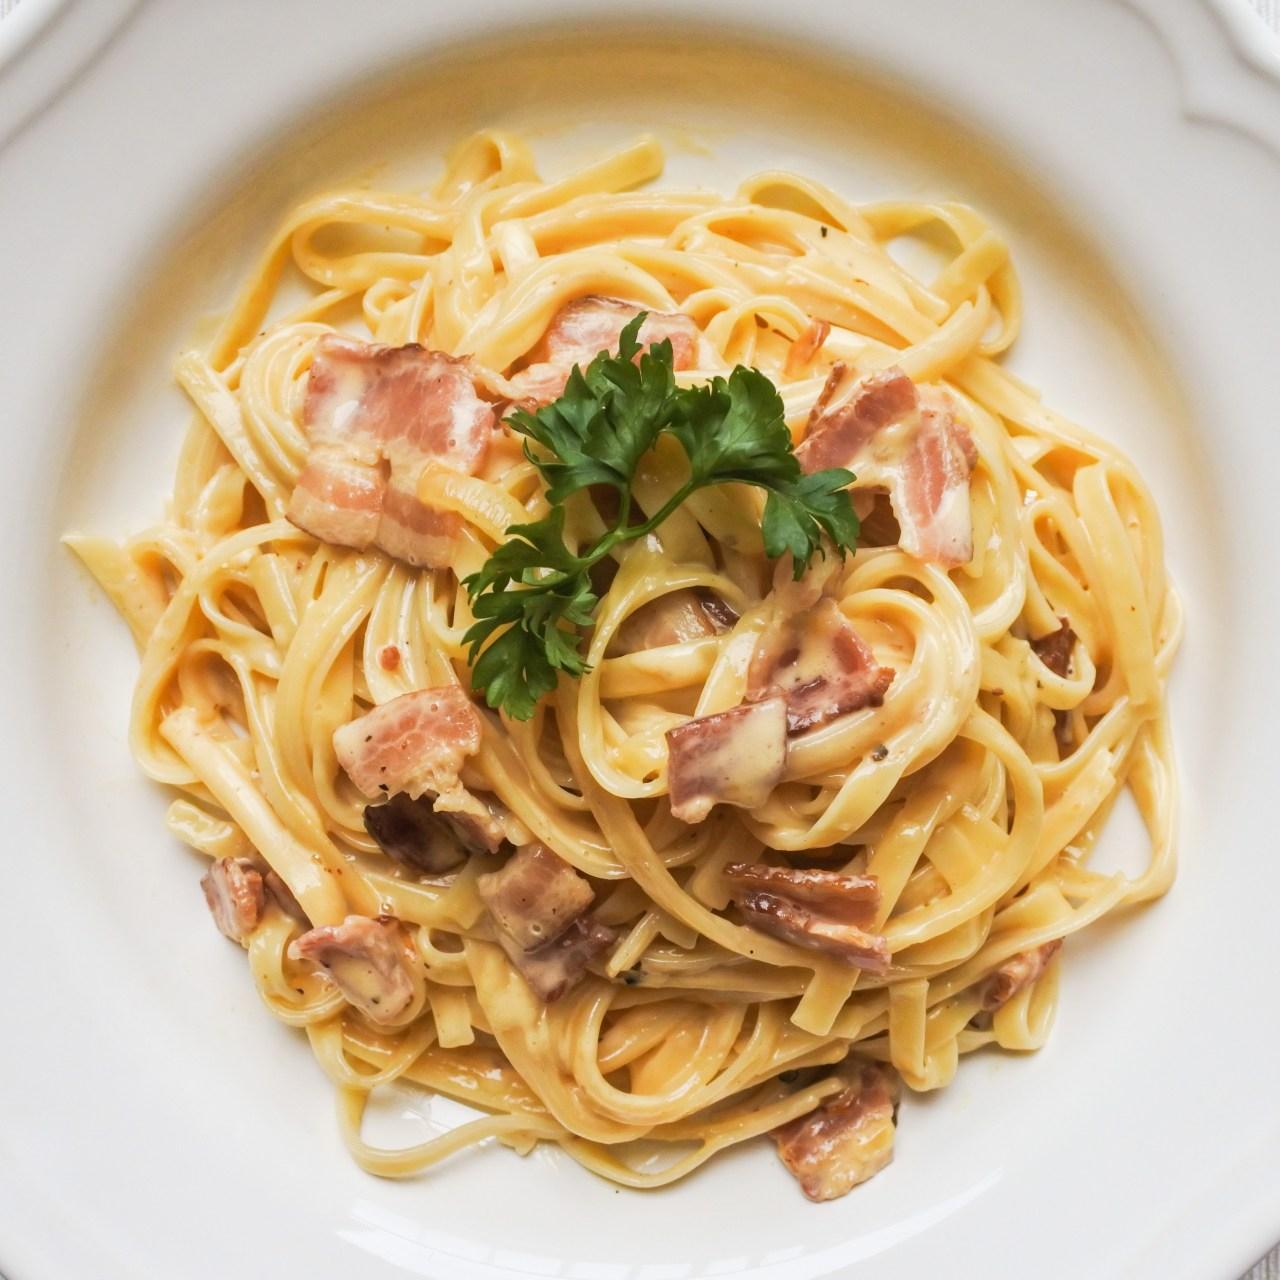 Pasta Carbonara garnished with a sprig of parsley